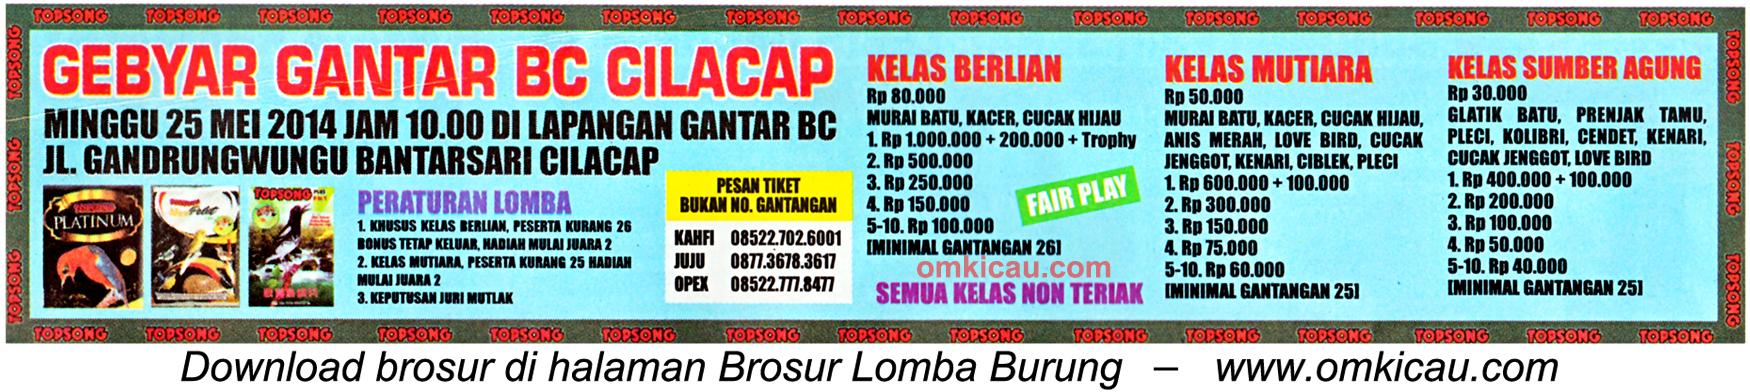 Brosur Lomba Burung Berkicau Gebyar Gantar BC, Cilacap, 25 Mei 2014